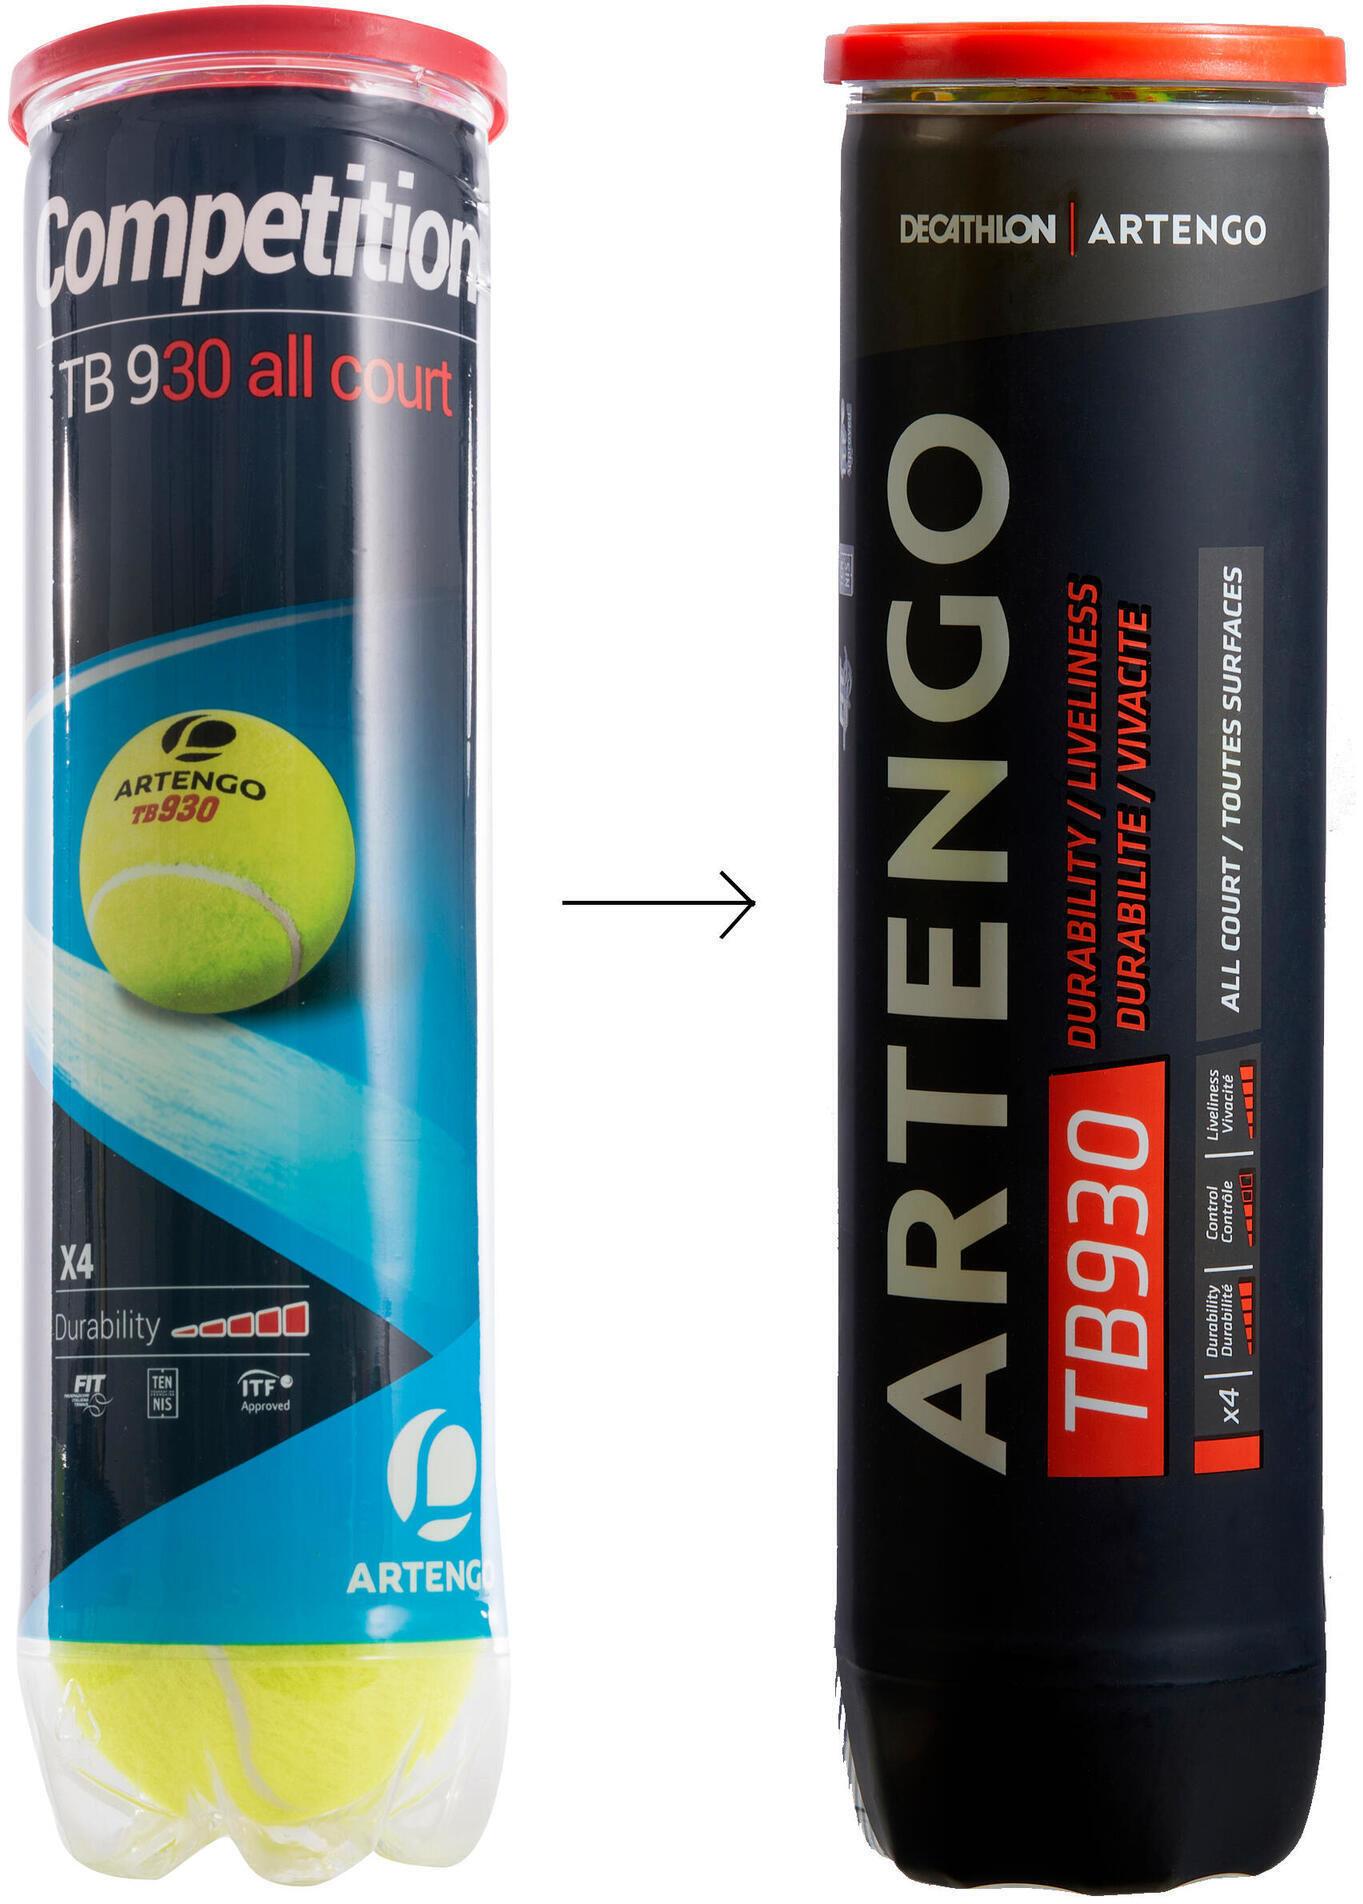 Piłka tenisowa Artengo TB930 SPEED 4 sztuki